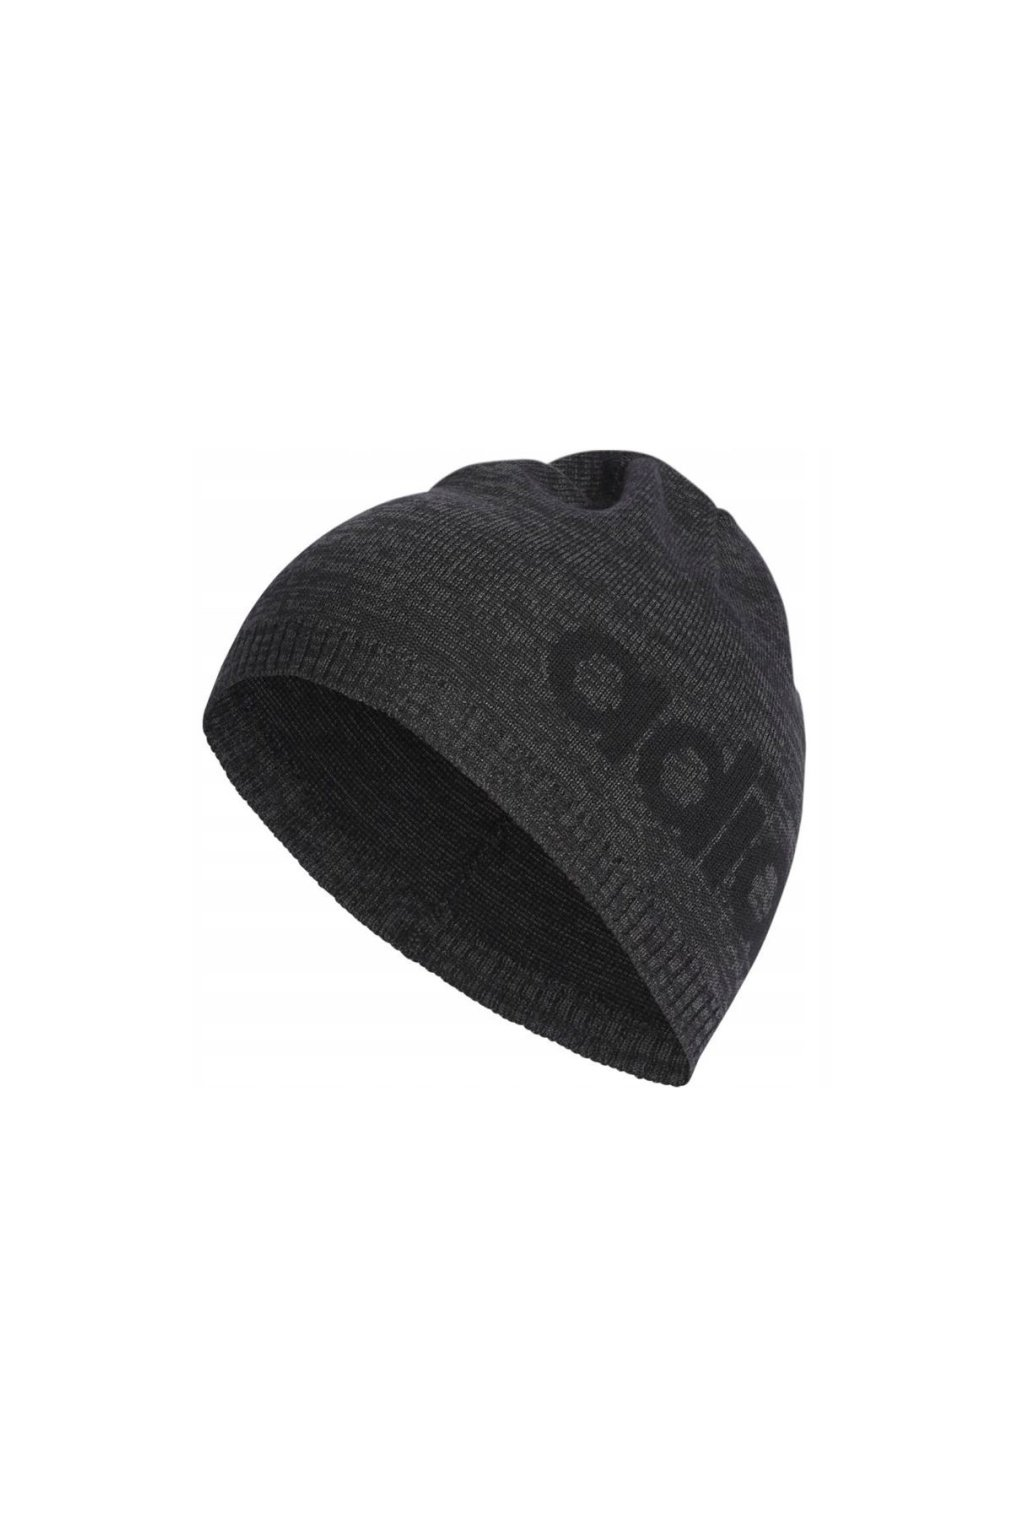 Pánska čiapka Adidas DN8445 - Fresh sport d9b52b9fe1f